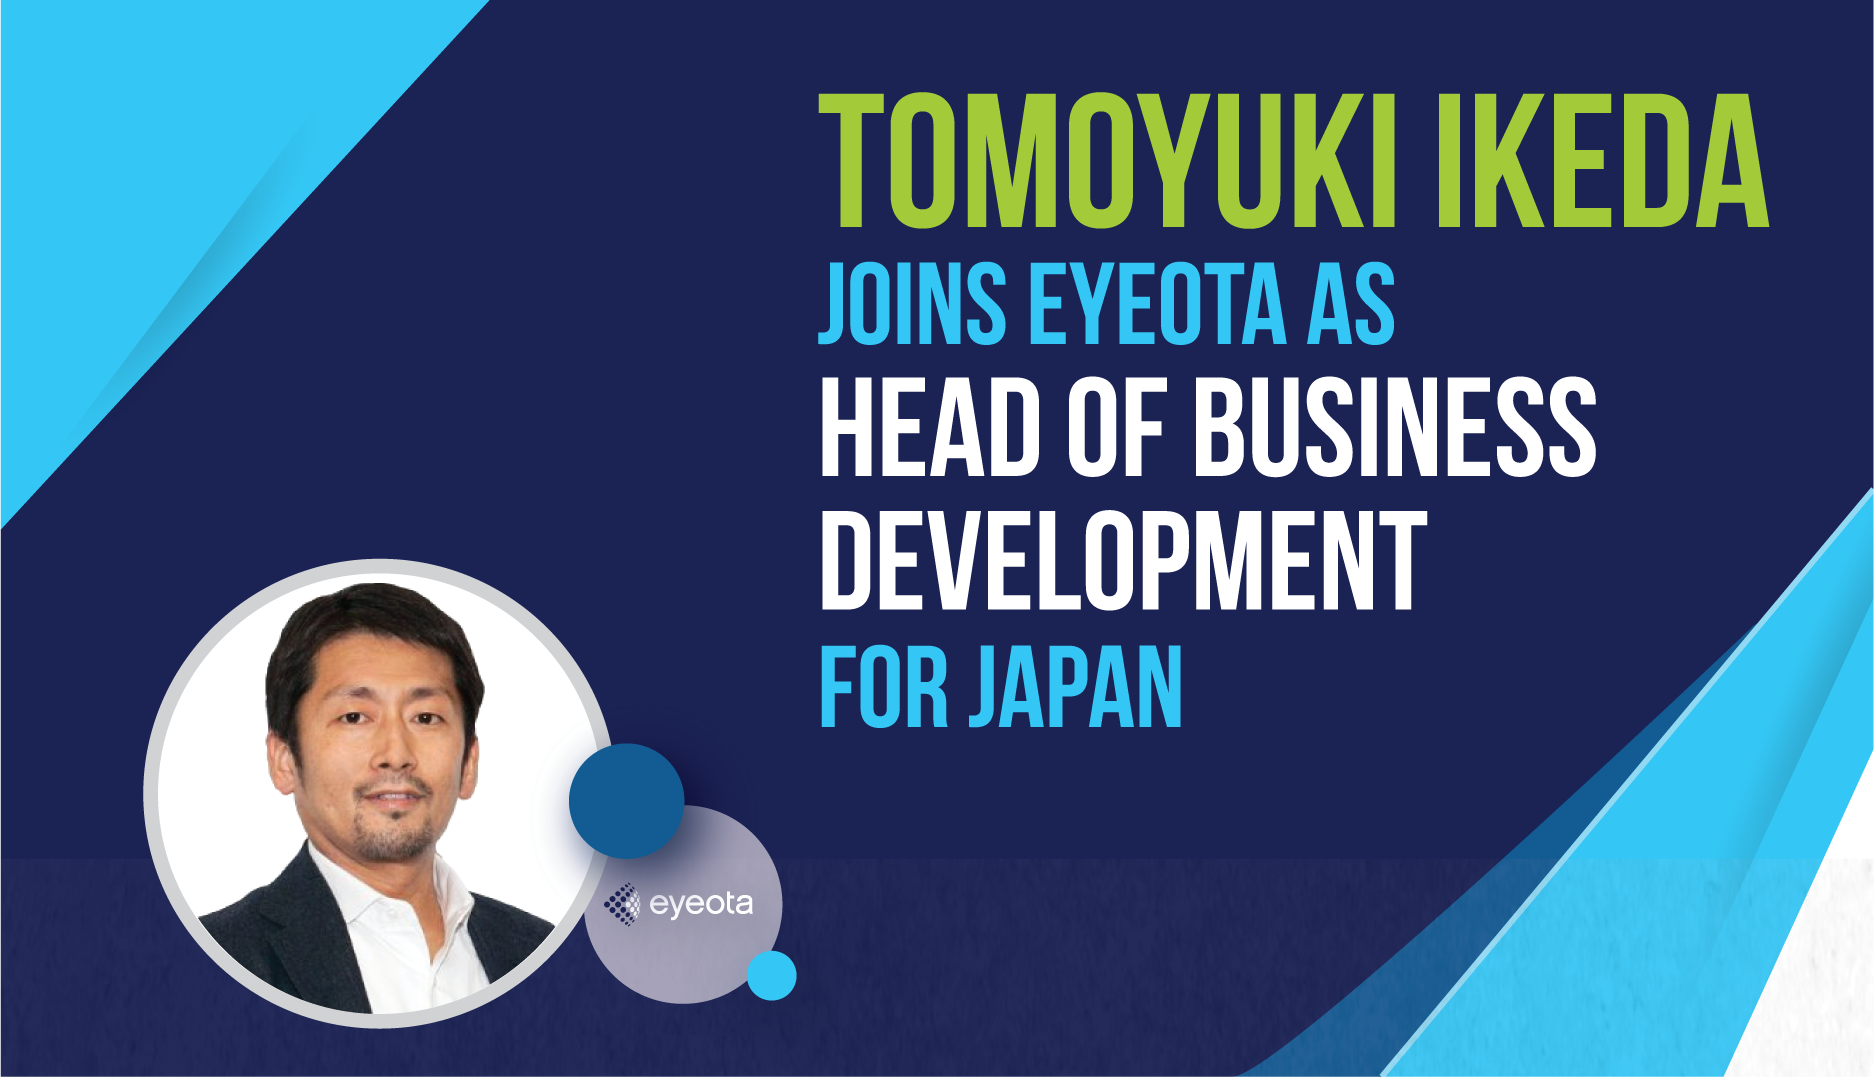 Tomoyuki Ikeda Joins Eyeota as Head of Business Development for Japan